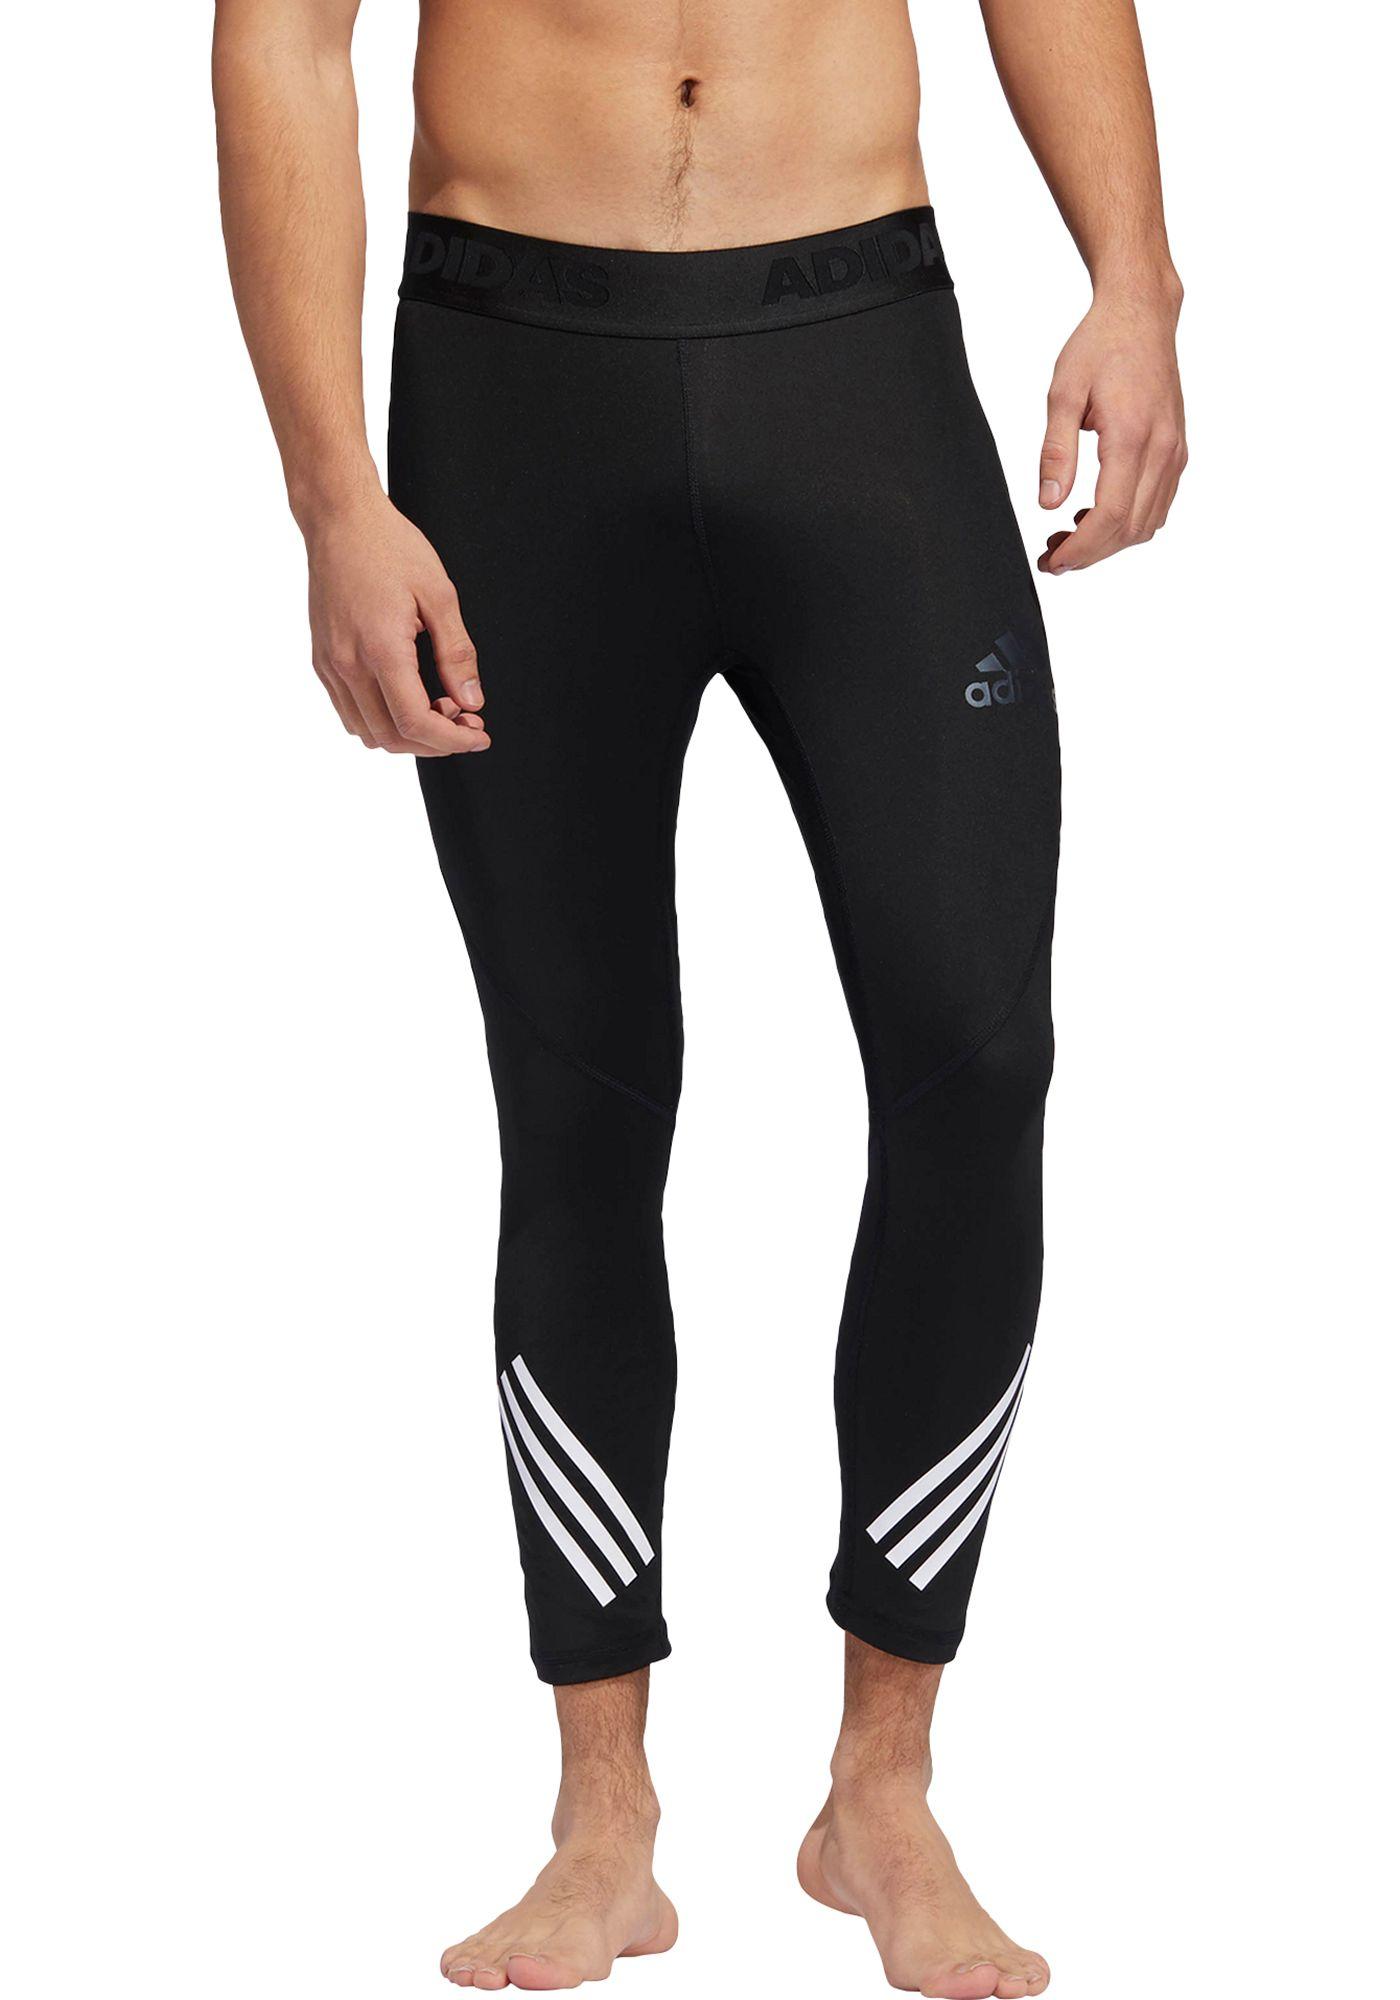 adidas Men's Alphaskin Sport ¾ Length Tights